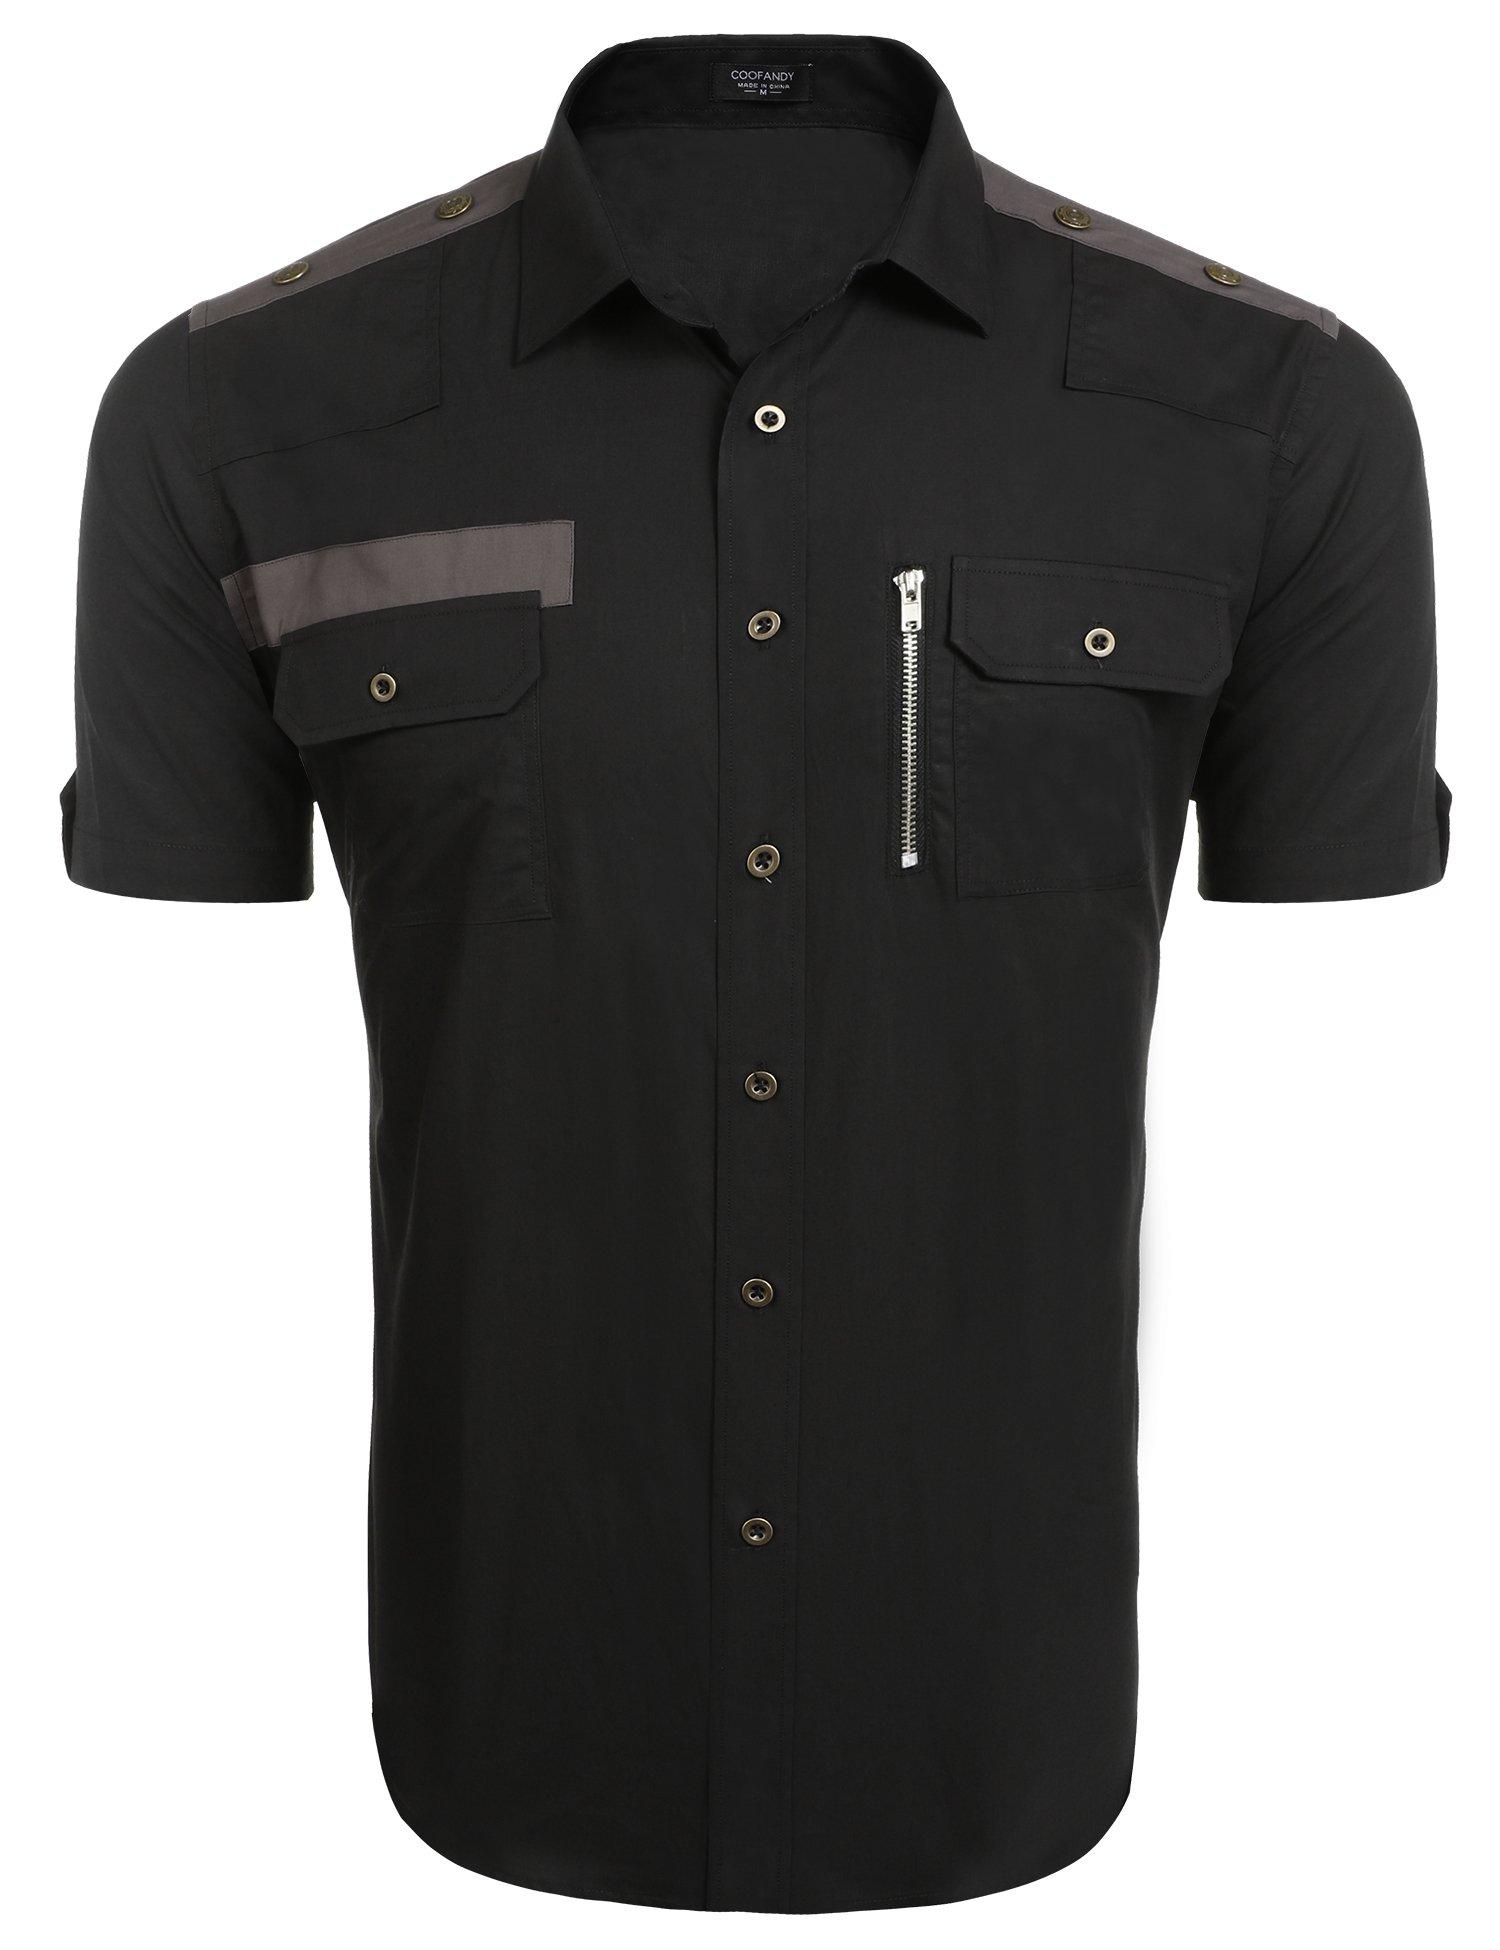 COOFANDY Mens Casual Short-Sleeve Button Down Work Shirts,Black,Medium Black Medium